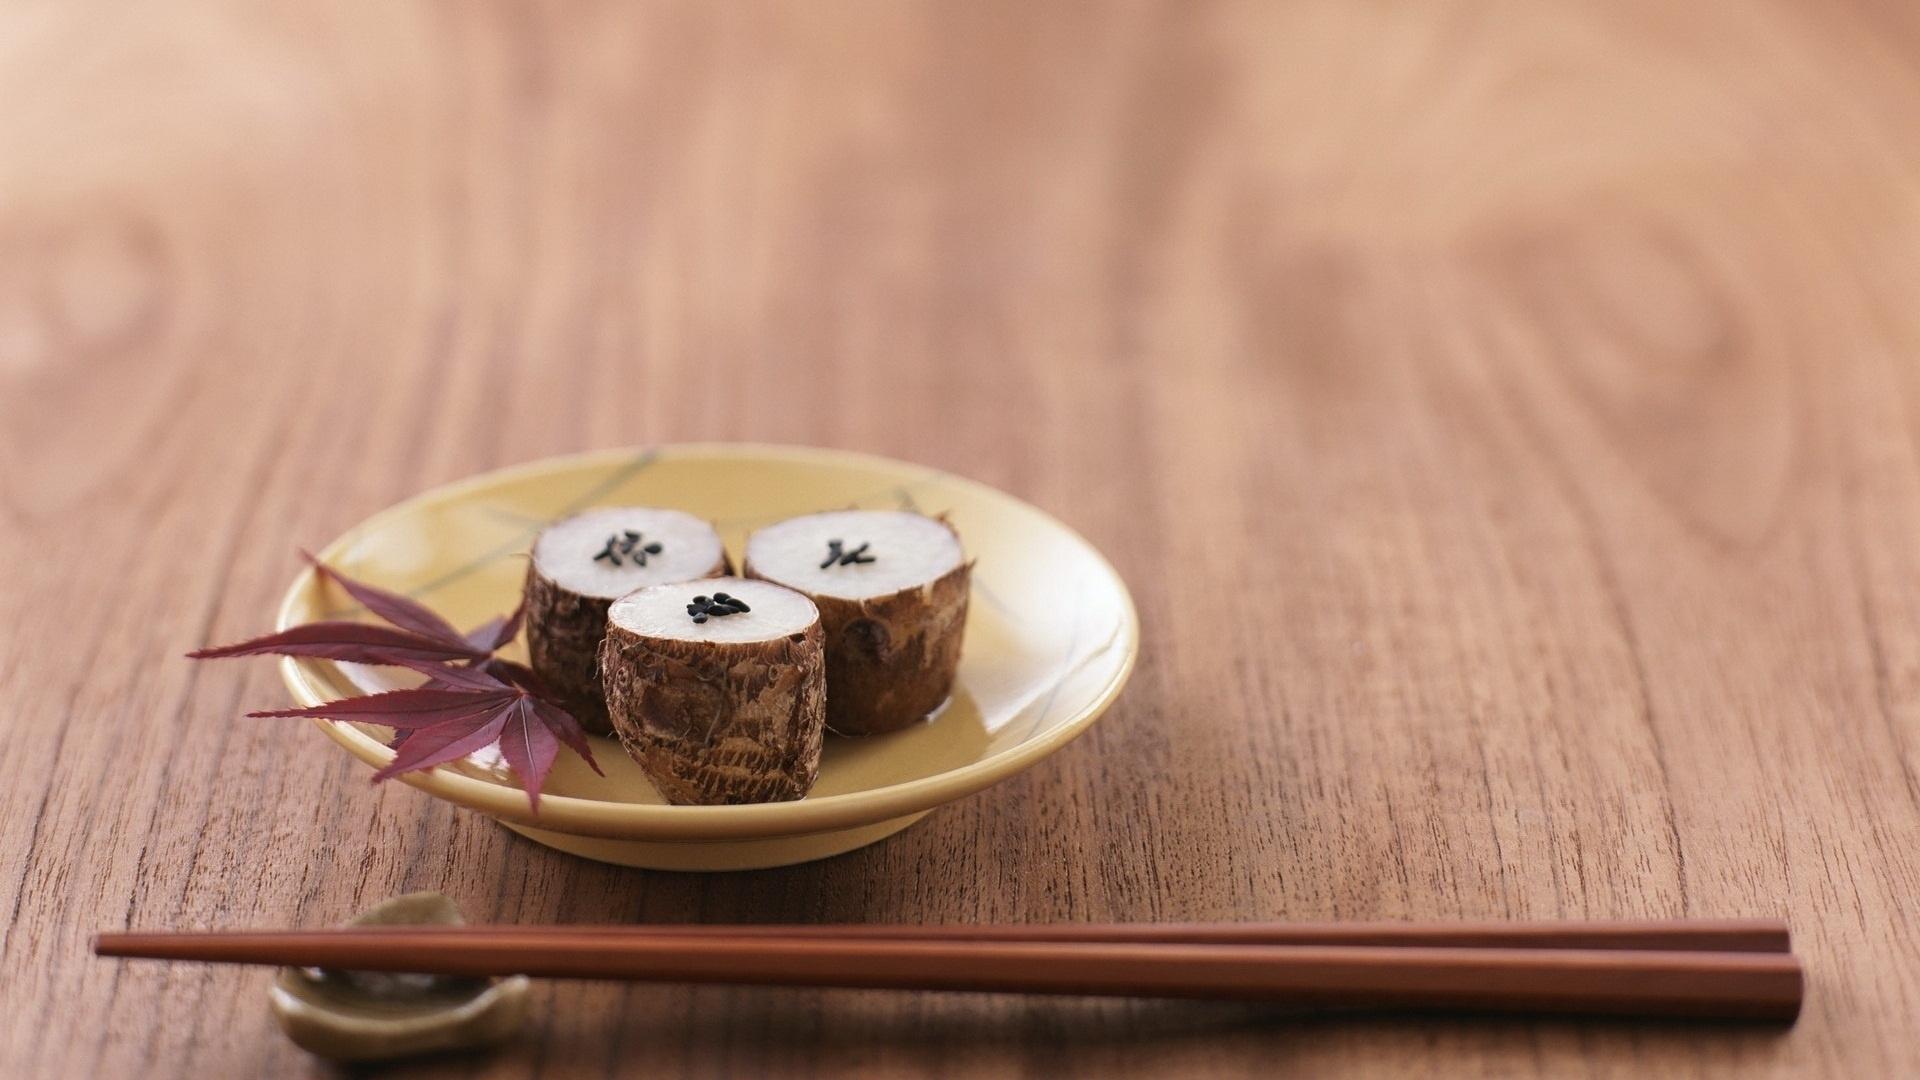 Download Wallpaper 1920x1080 Sushi Sticks Sesame Chinese Cuisine